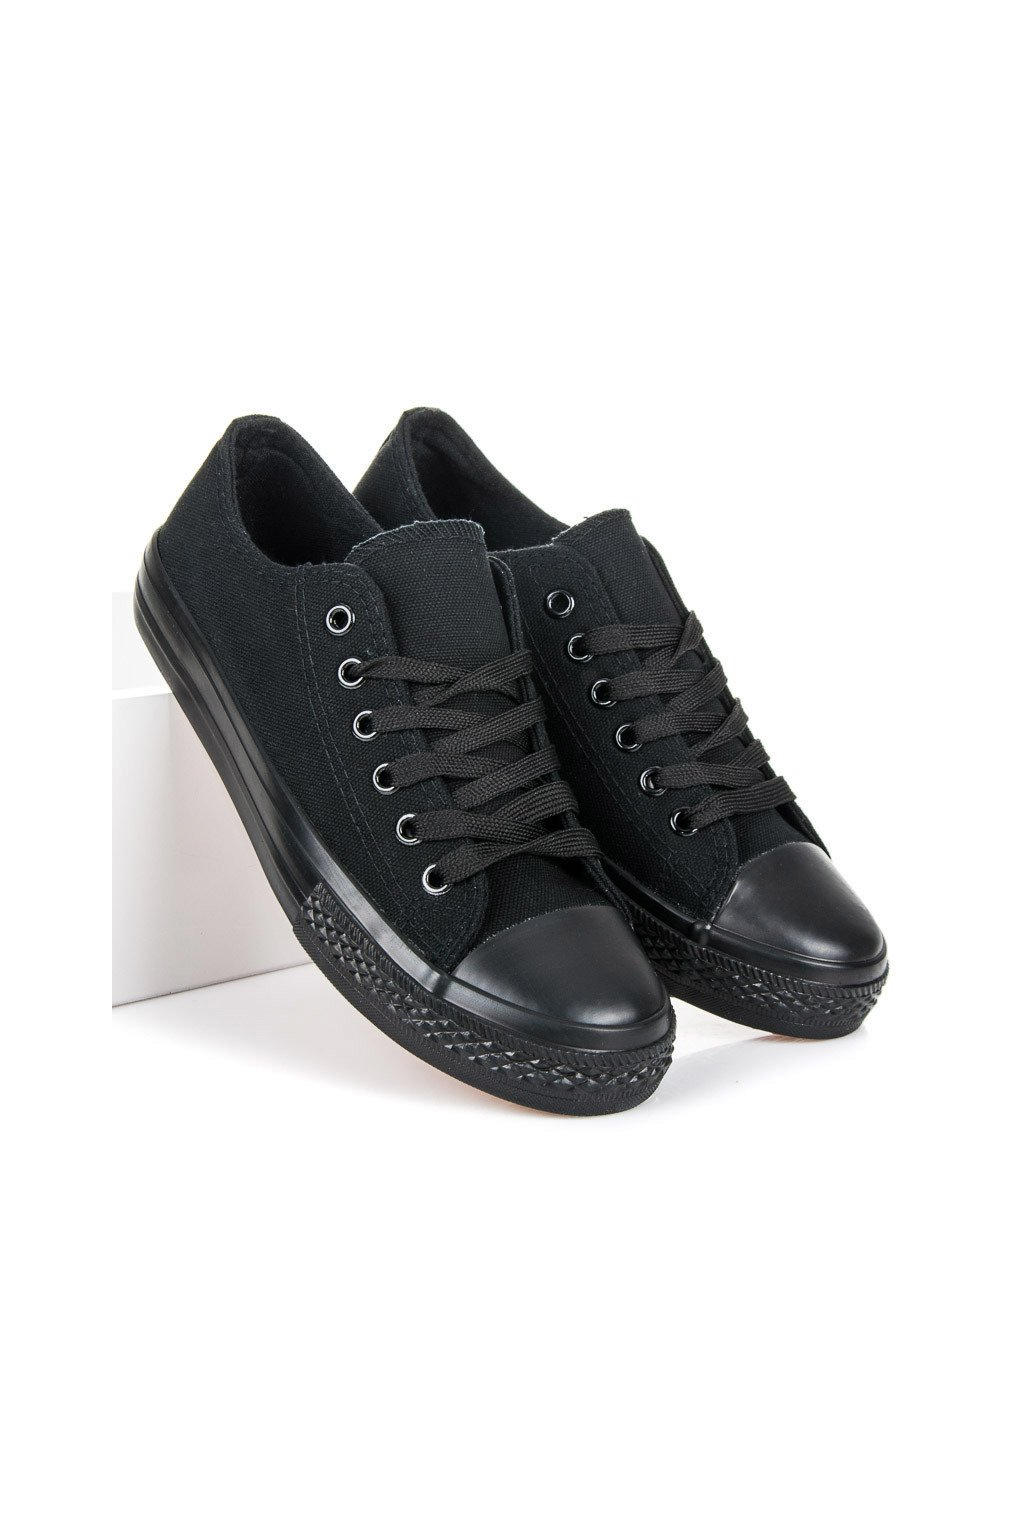 Čierne tenisky Shelovet kod XL03B/